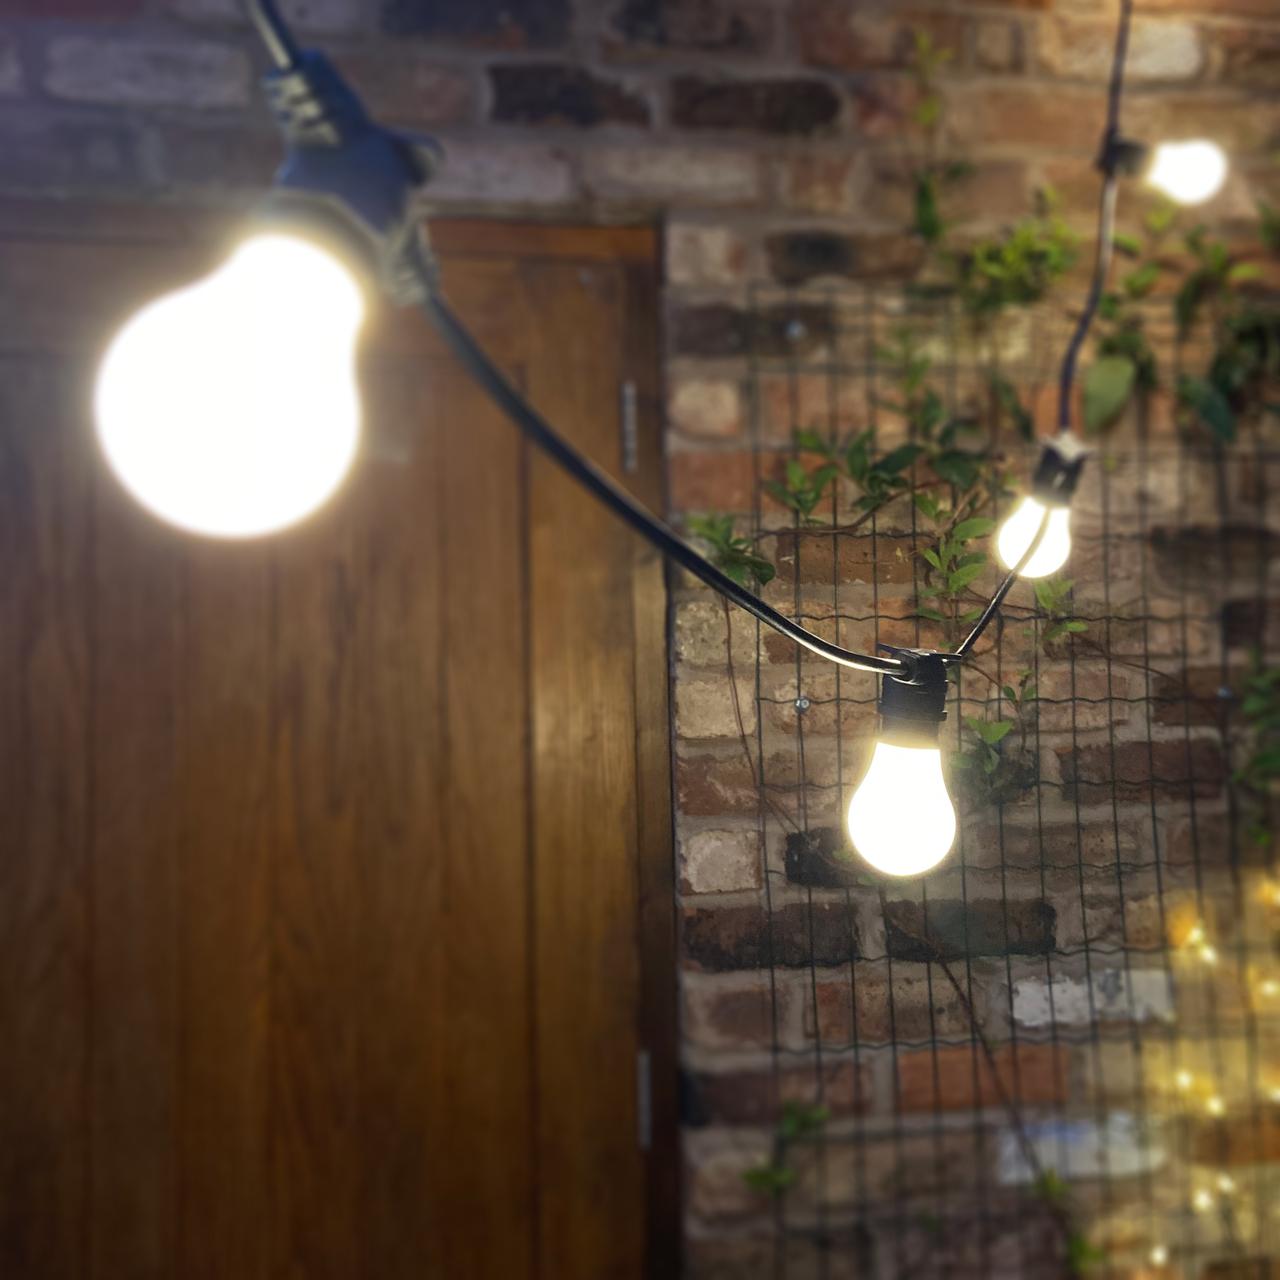 Ultra LEDs Outdoor Festoon Bulb Lights